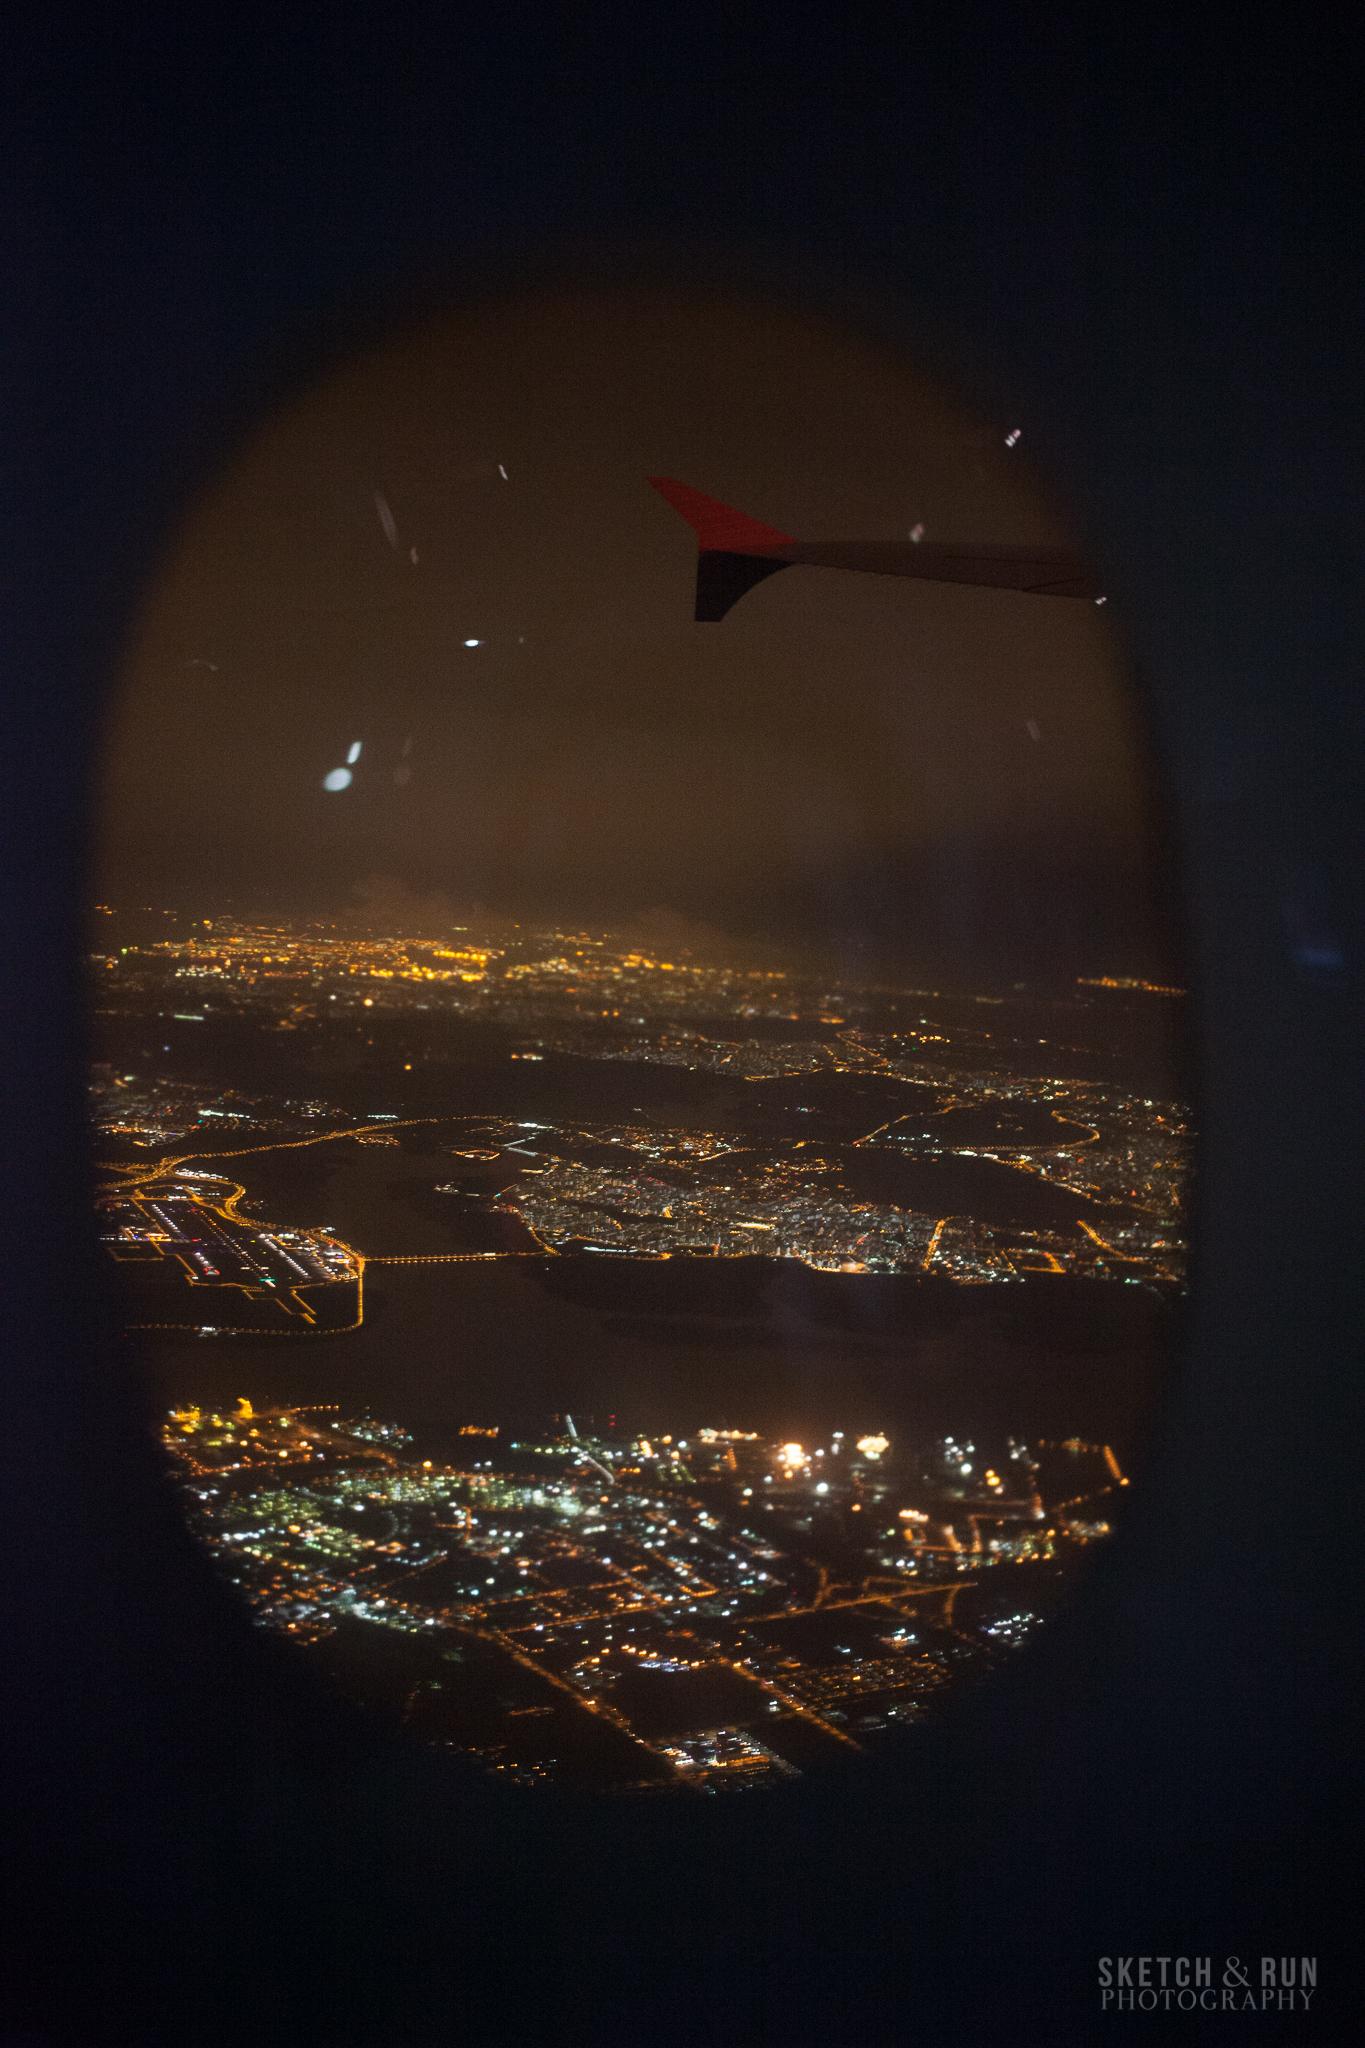 planewindow-1.jpg